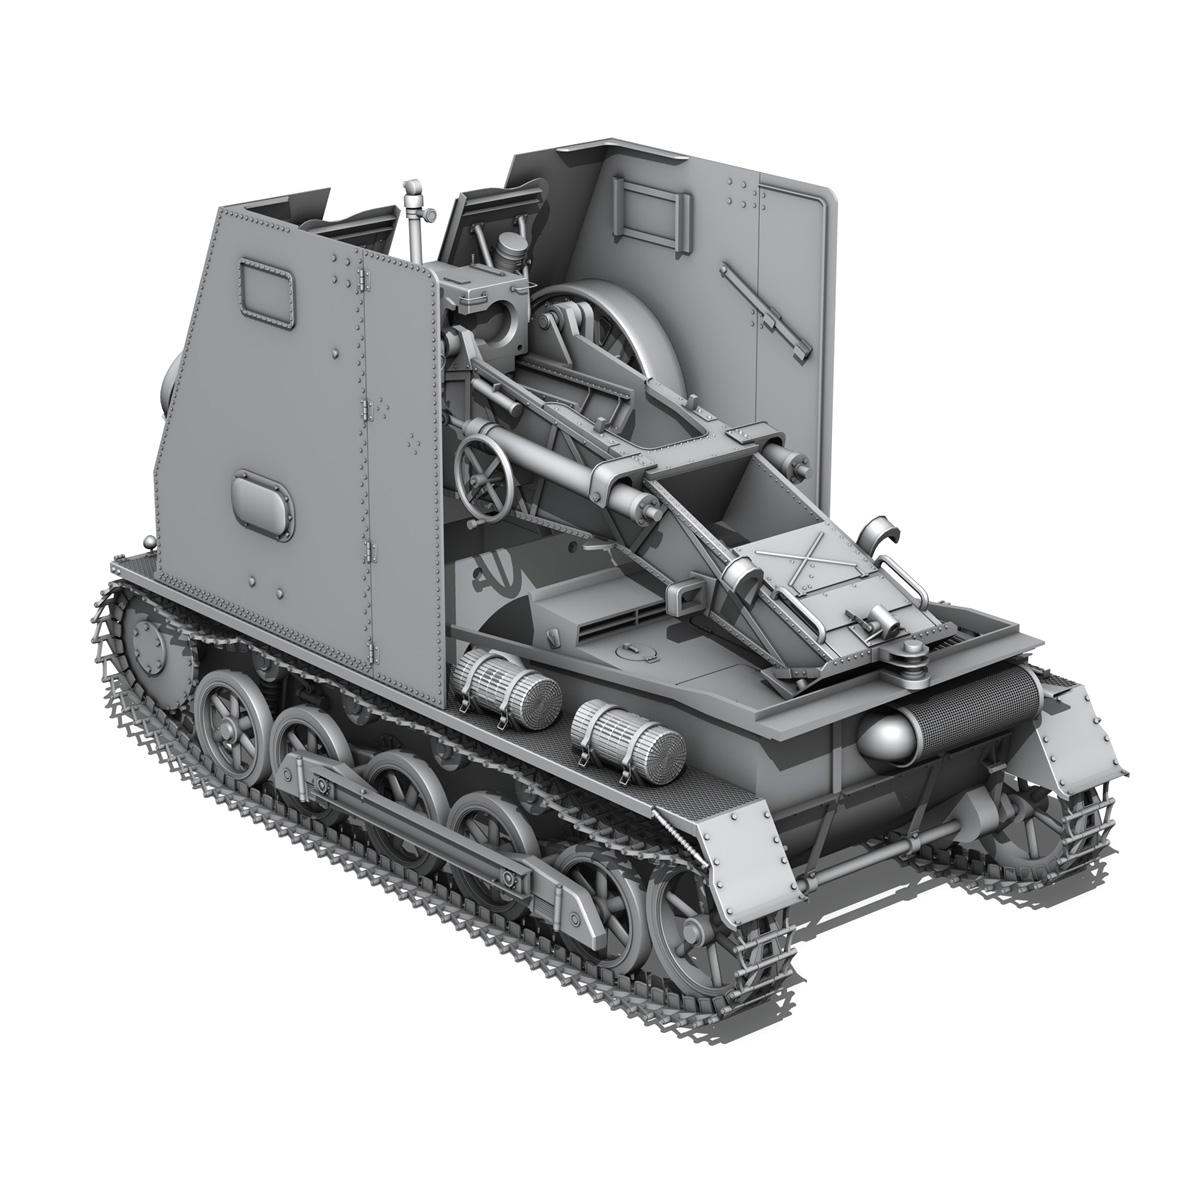 sd.kfz 101 – sturmpanzer 1 – bison 3d model 3ds fbx c4d lwo obj 189273